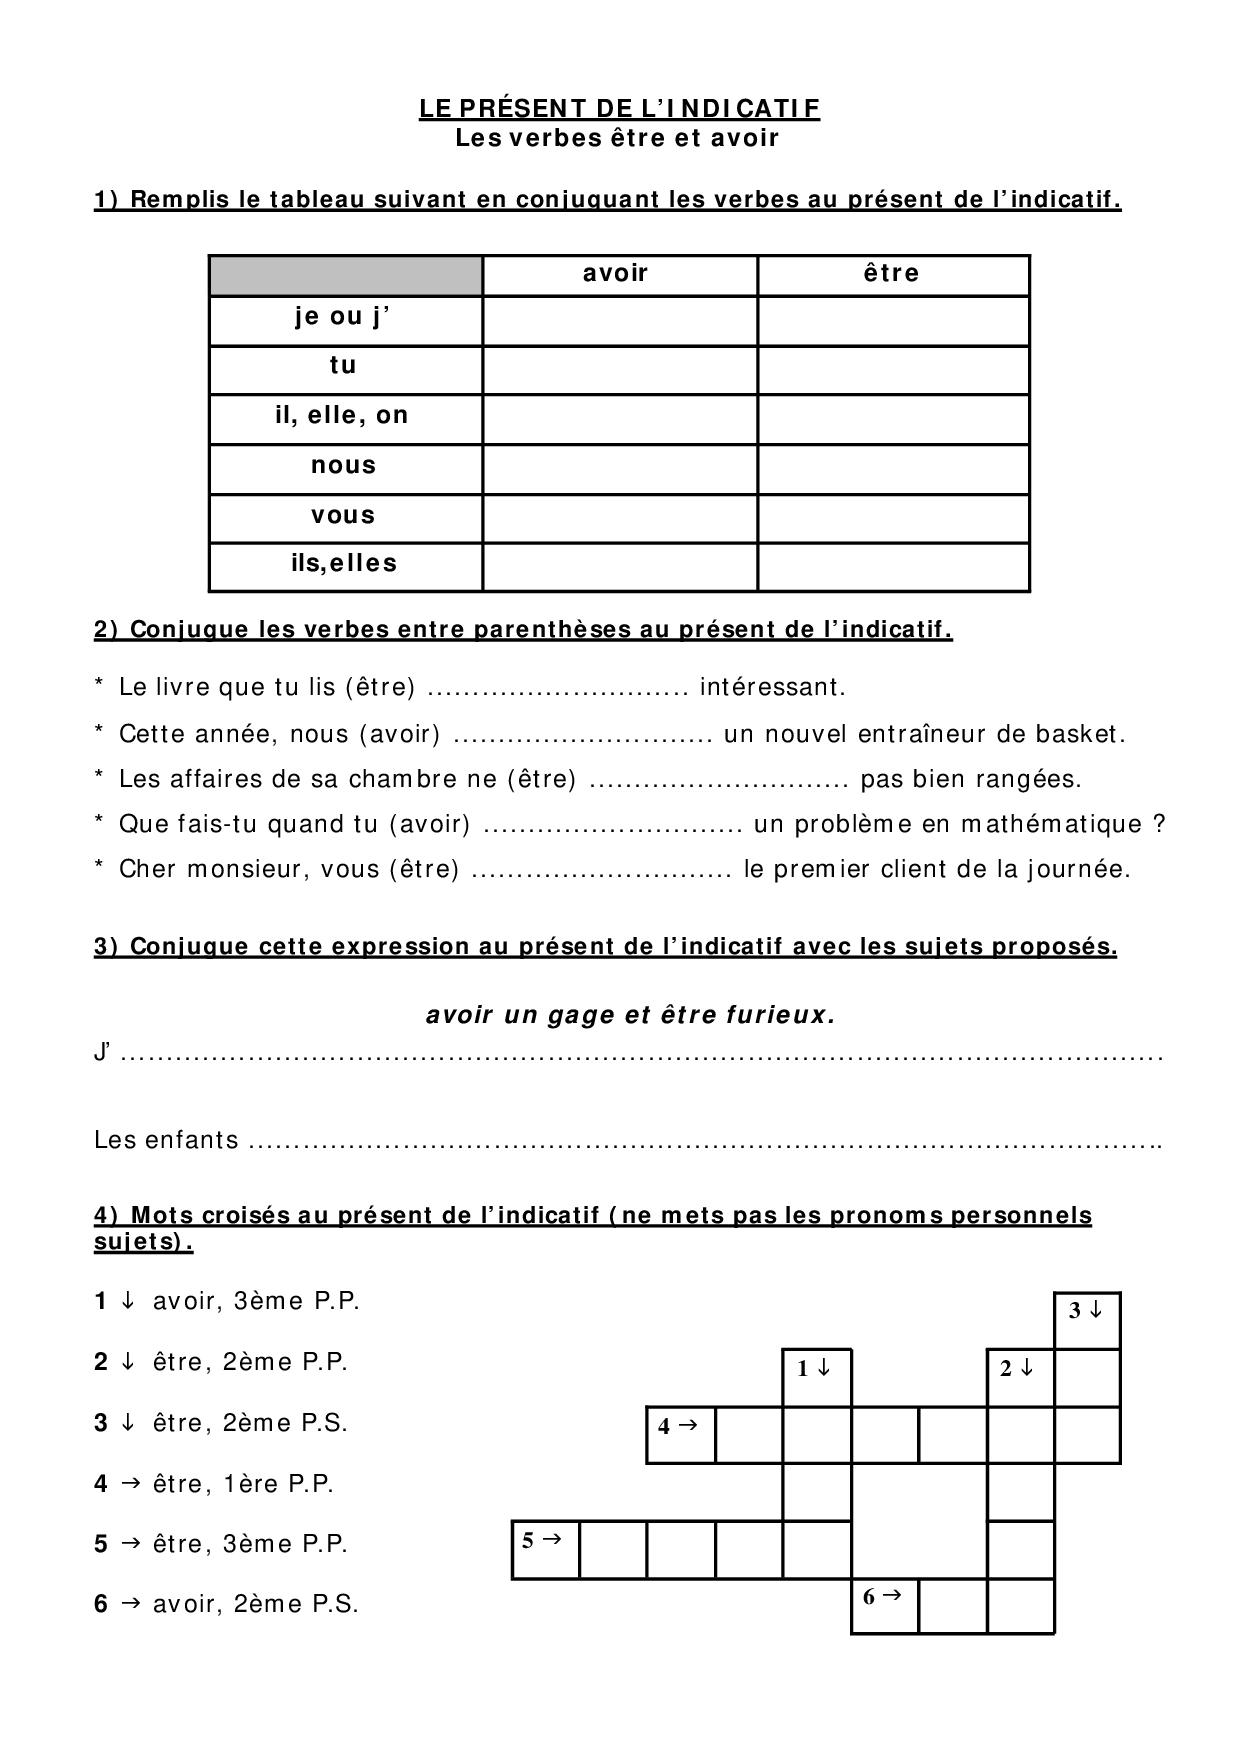 Le Present De L Indicatif Les Verbes Etre Avoir Exercices Alloschool